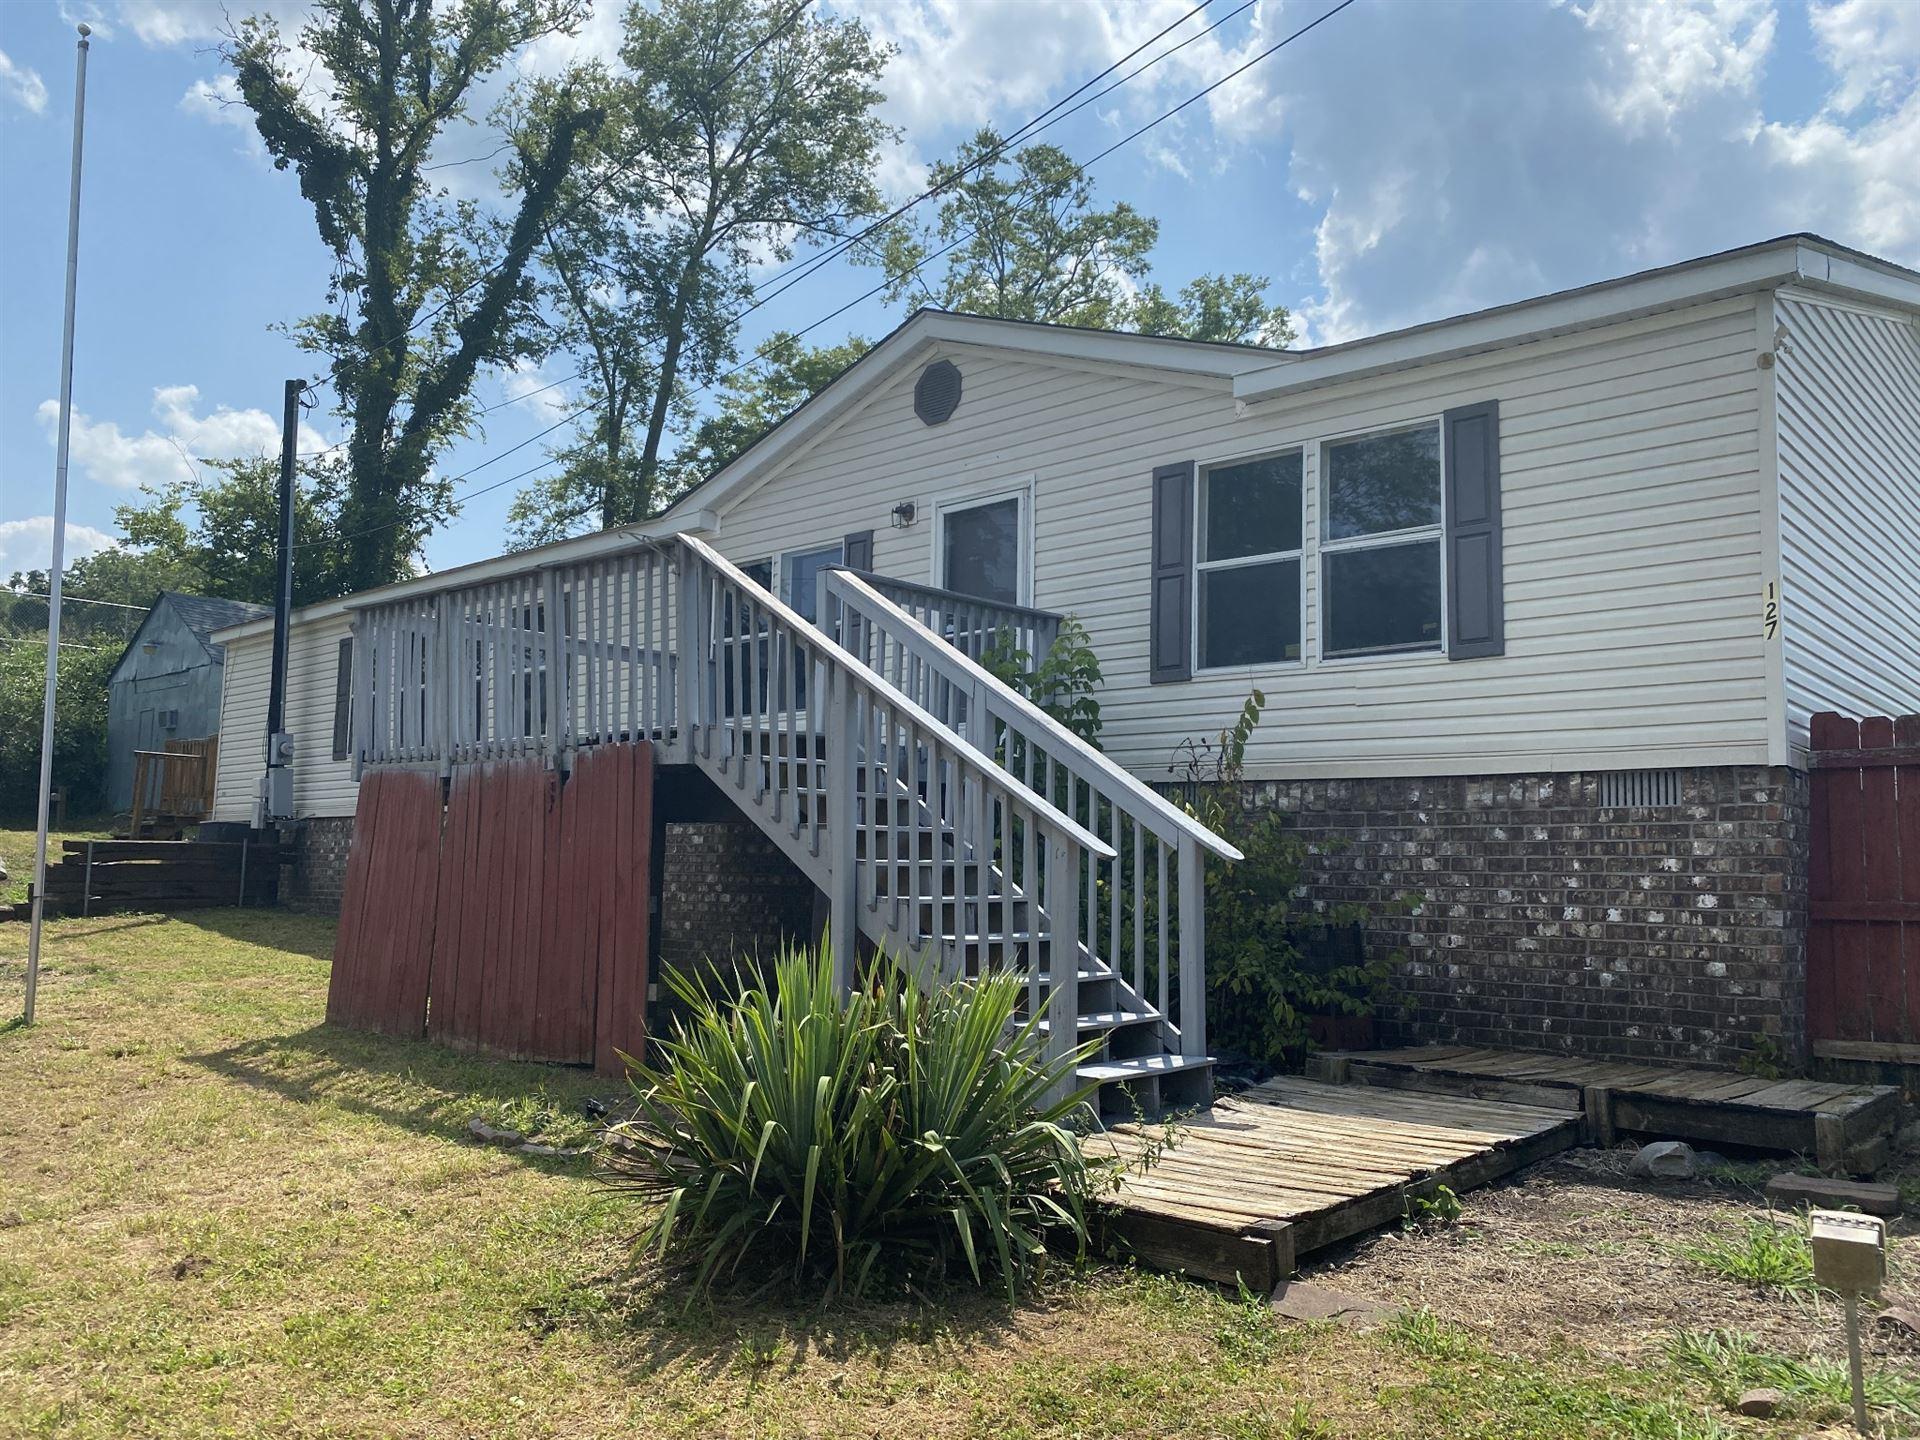 127 Greenwood Acres Dr, Columbia, TN 38401 - MLS#: 2277667